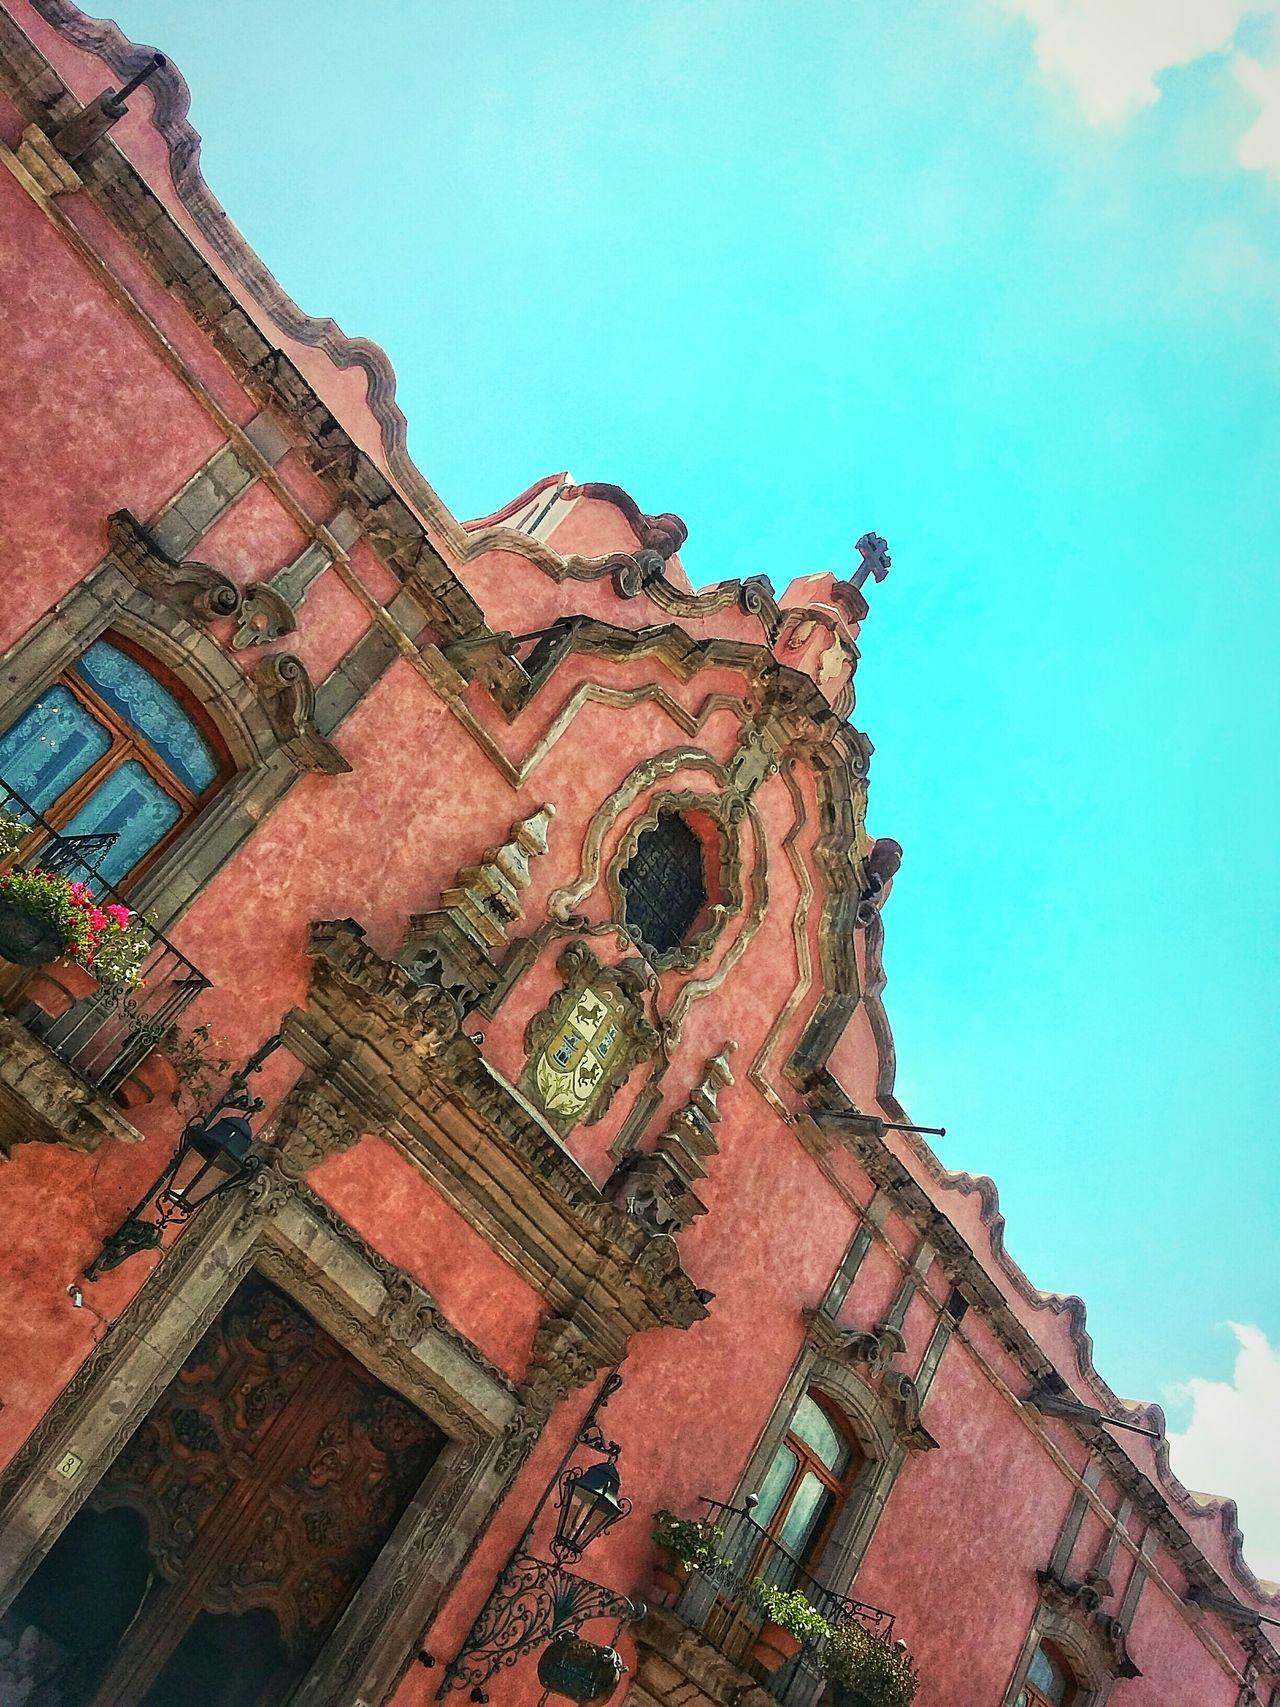 Casa De La Marquesa My City Colors Downtown Walking Around Queretaro, Mex. Architecture Sky Old House